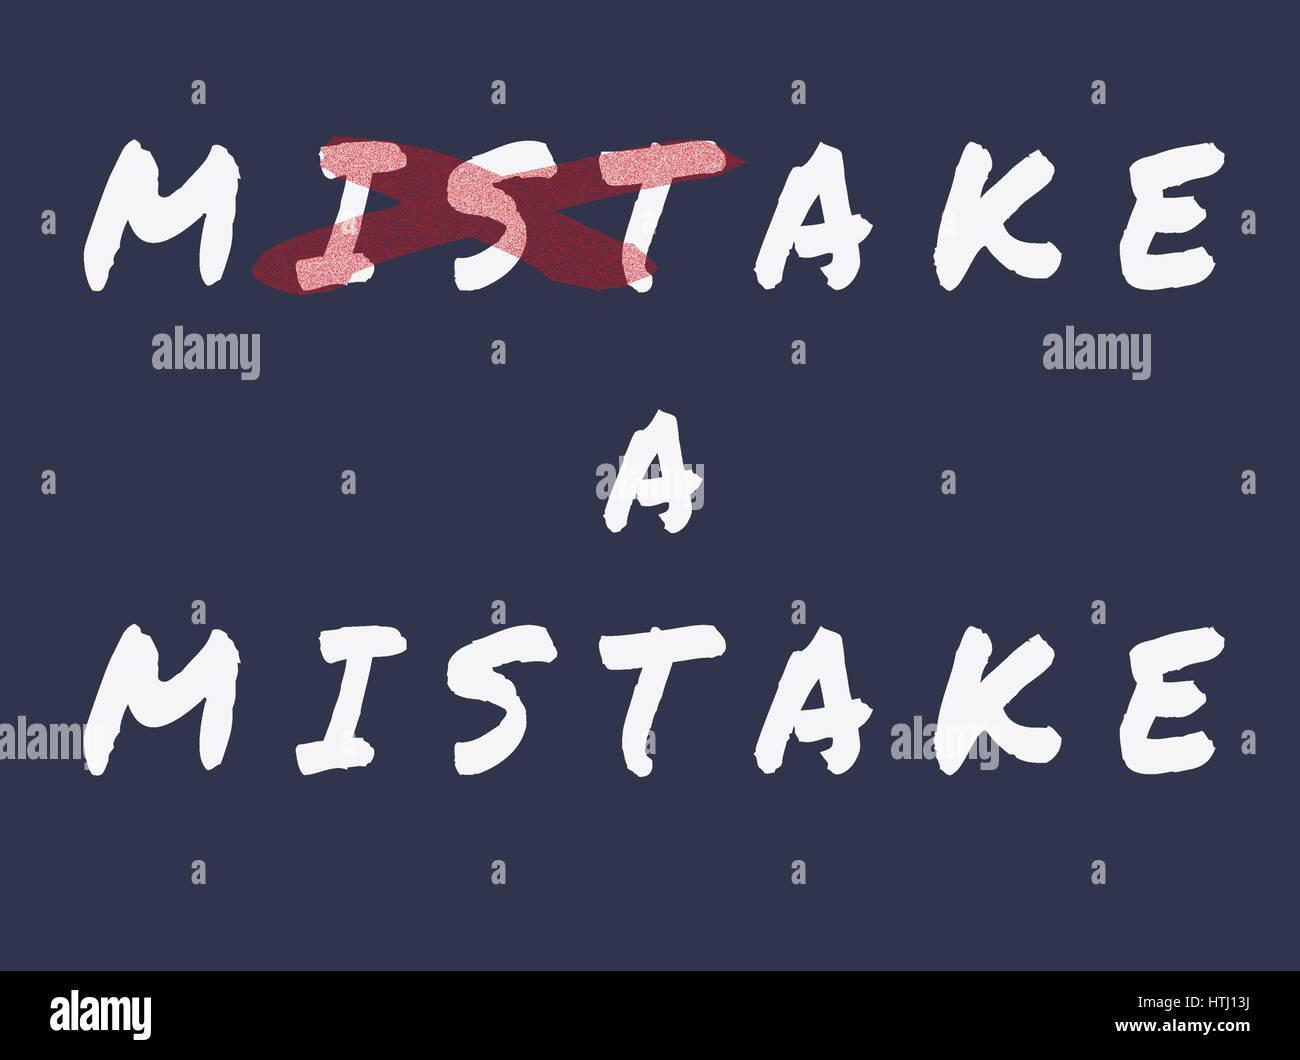 Make a mistake. - Stock Image